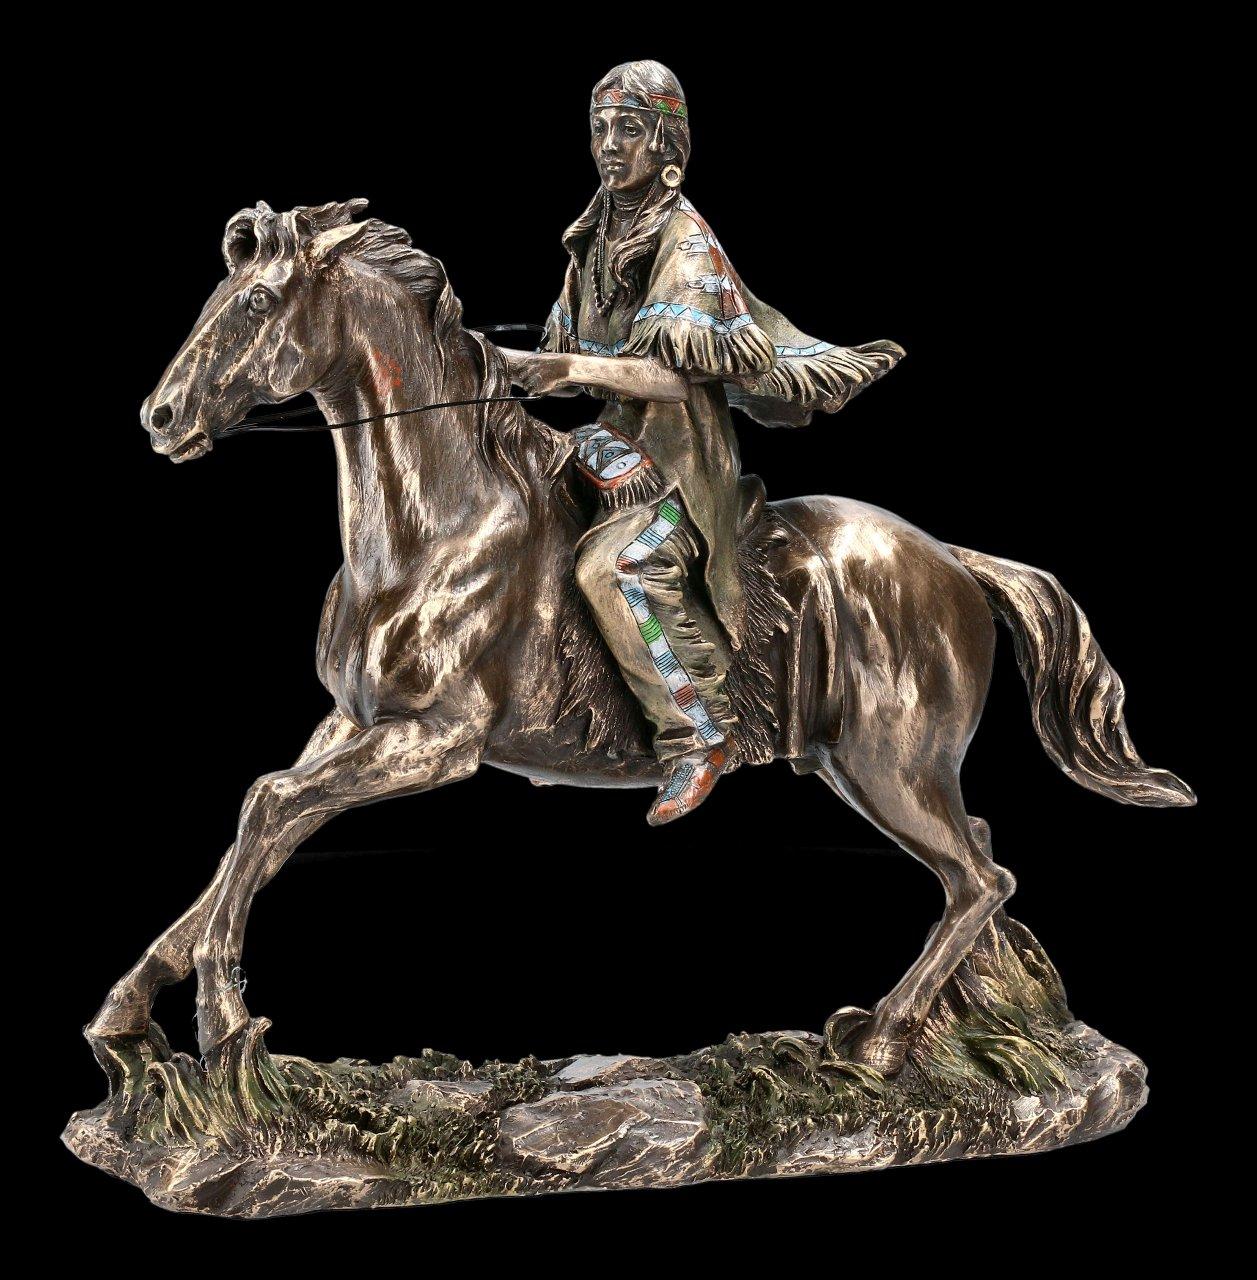 Female Indian Figurine - Riding on Horse